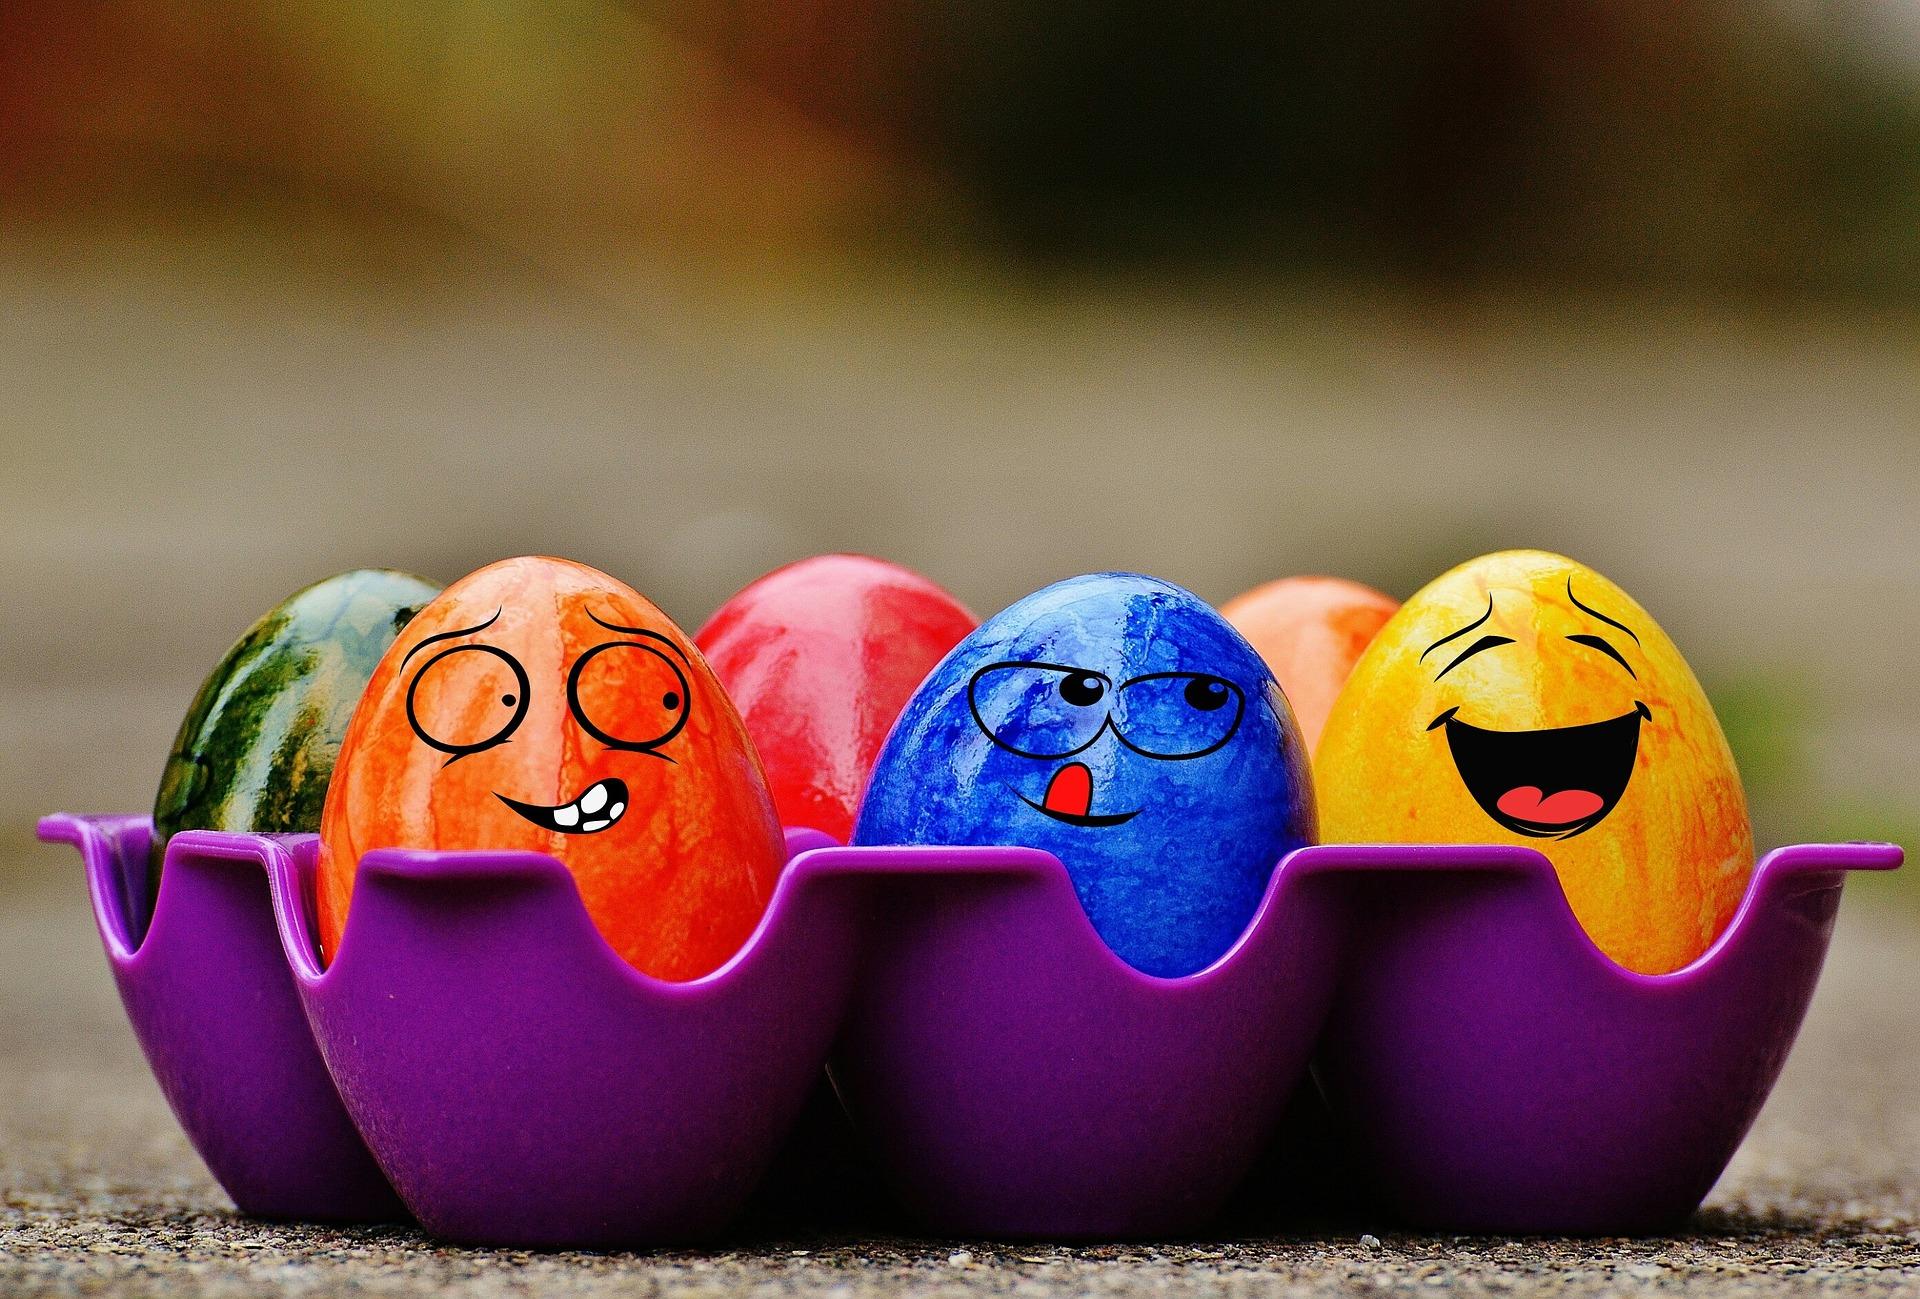 ईस्टर अंडे, ईस्टर, अंडे, रंग, चेहरे - HD वॉलपेपर - प्रोफेसर-falken.com